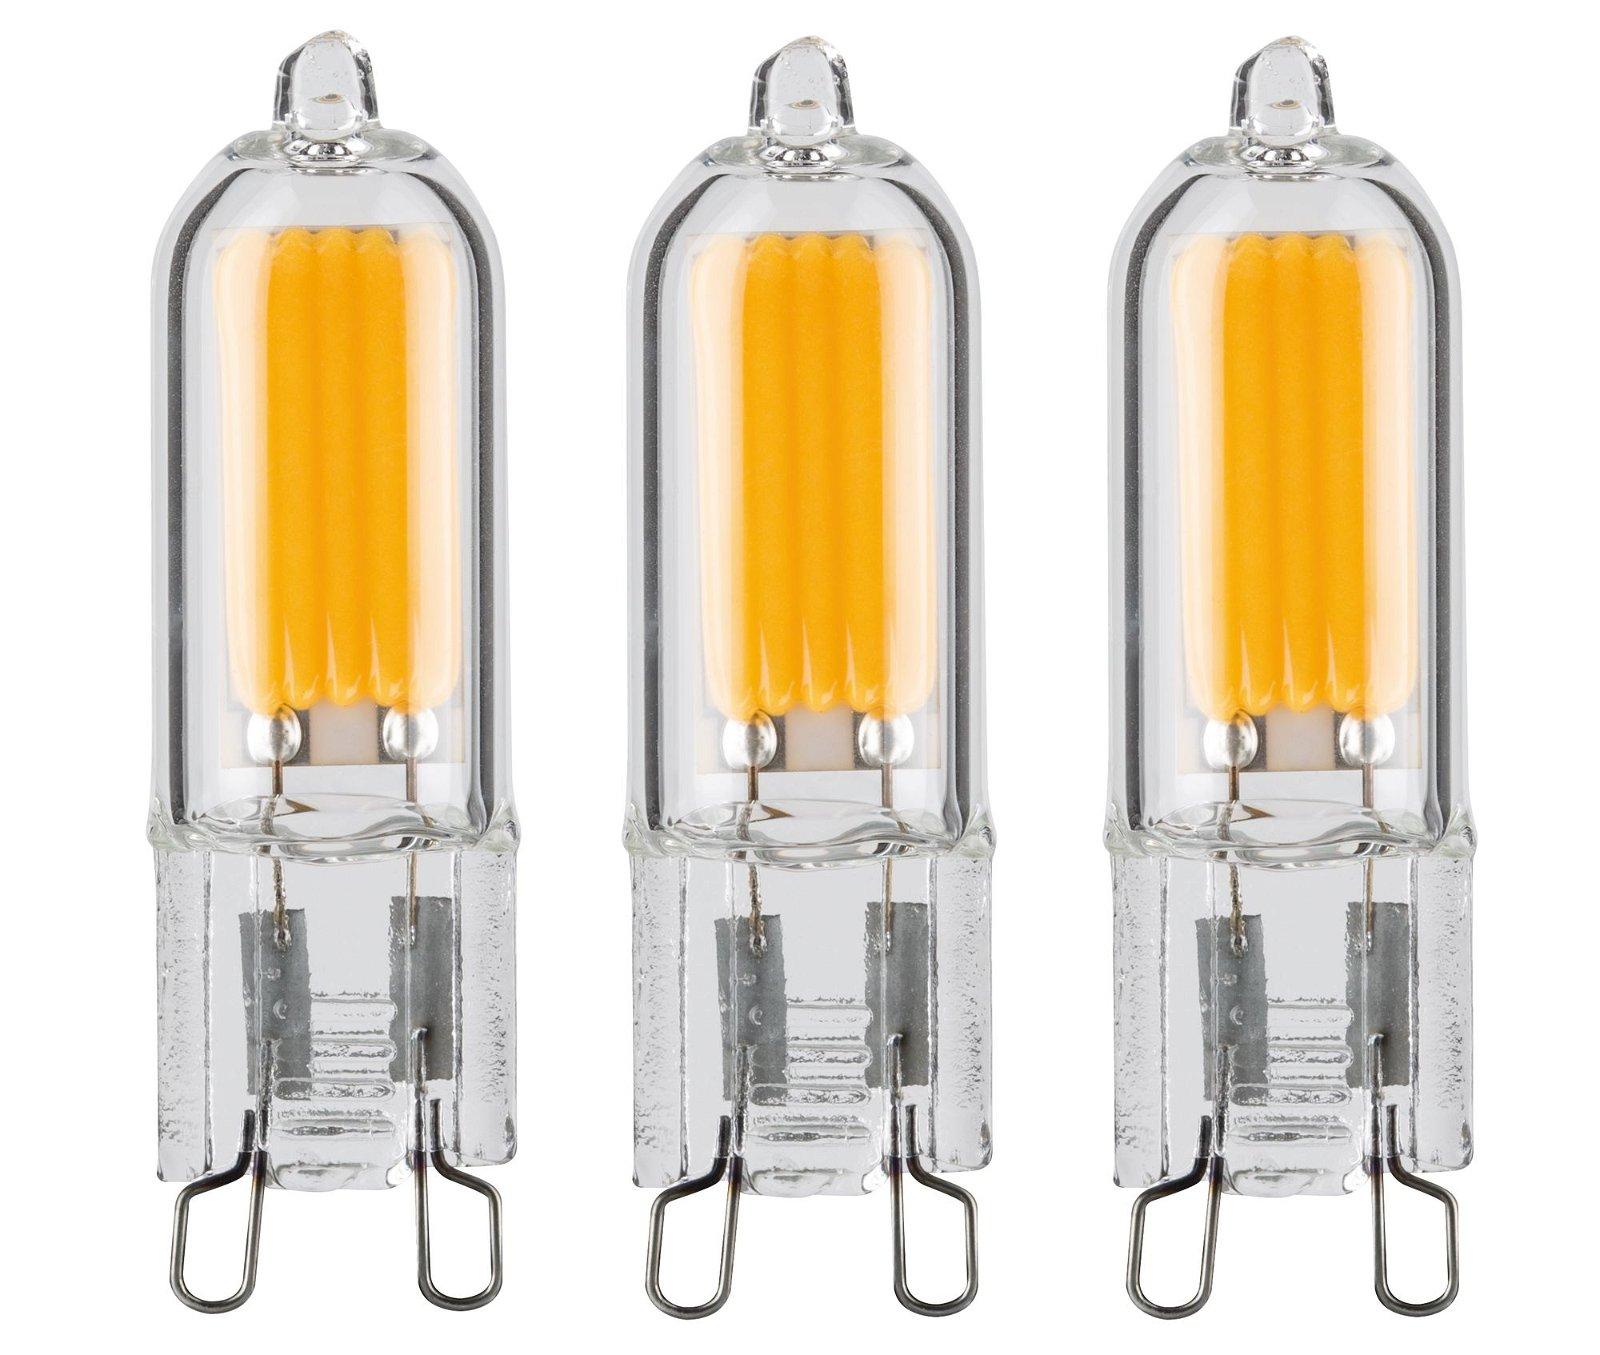 Culot à ergots LED Pack de 3 G9 230V 3x200lm 3x2W 2700K Clair